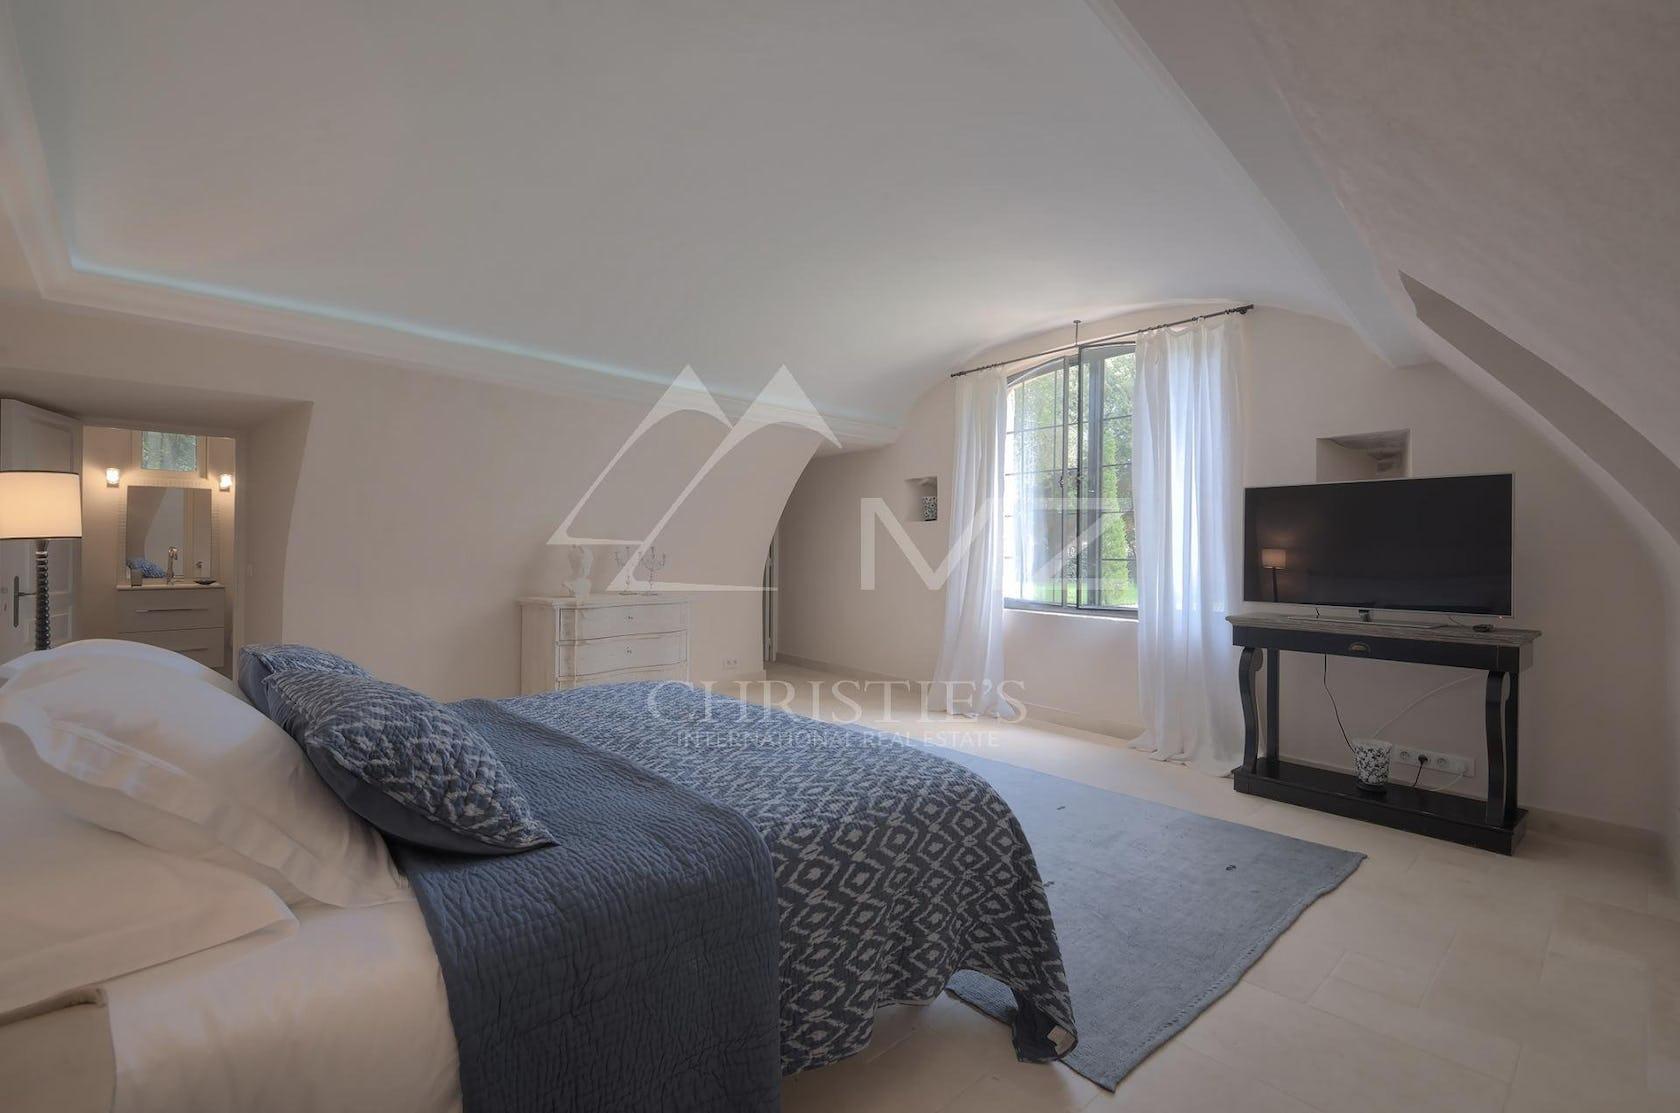 bedroom indoors room furniture interior design bed flooring